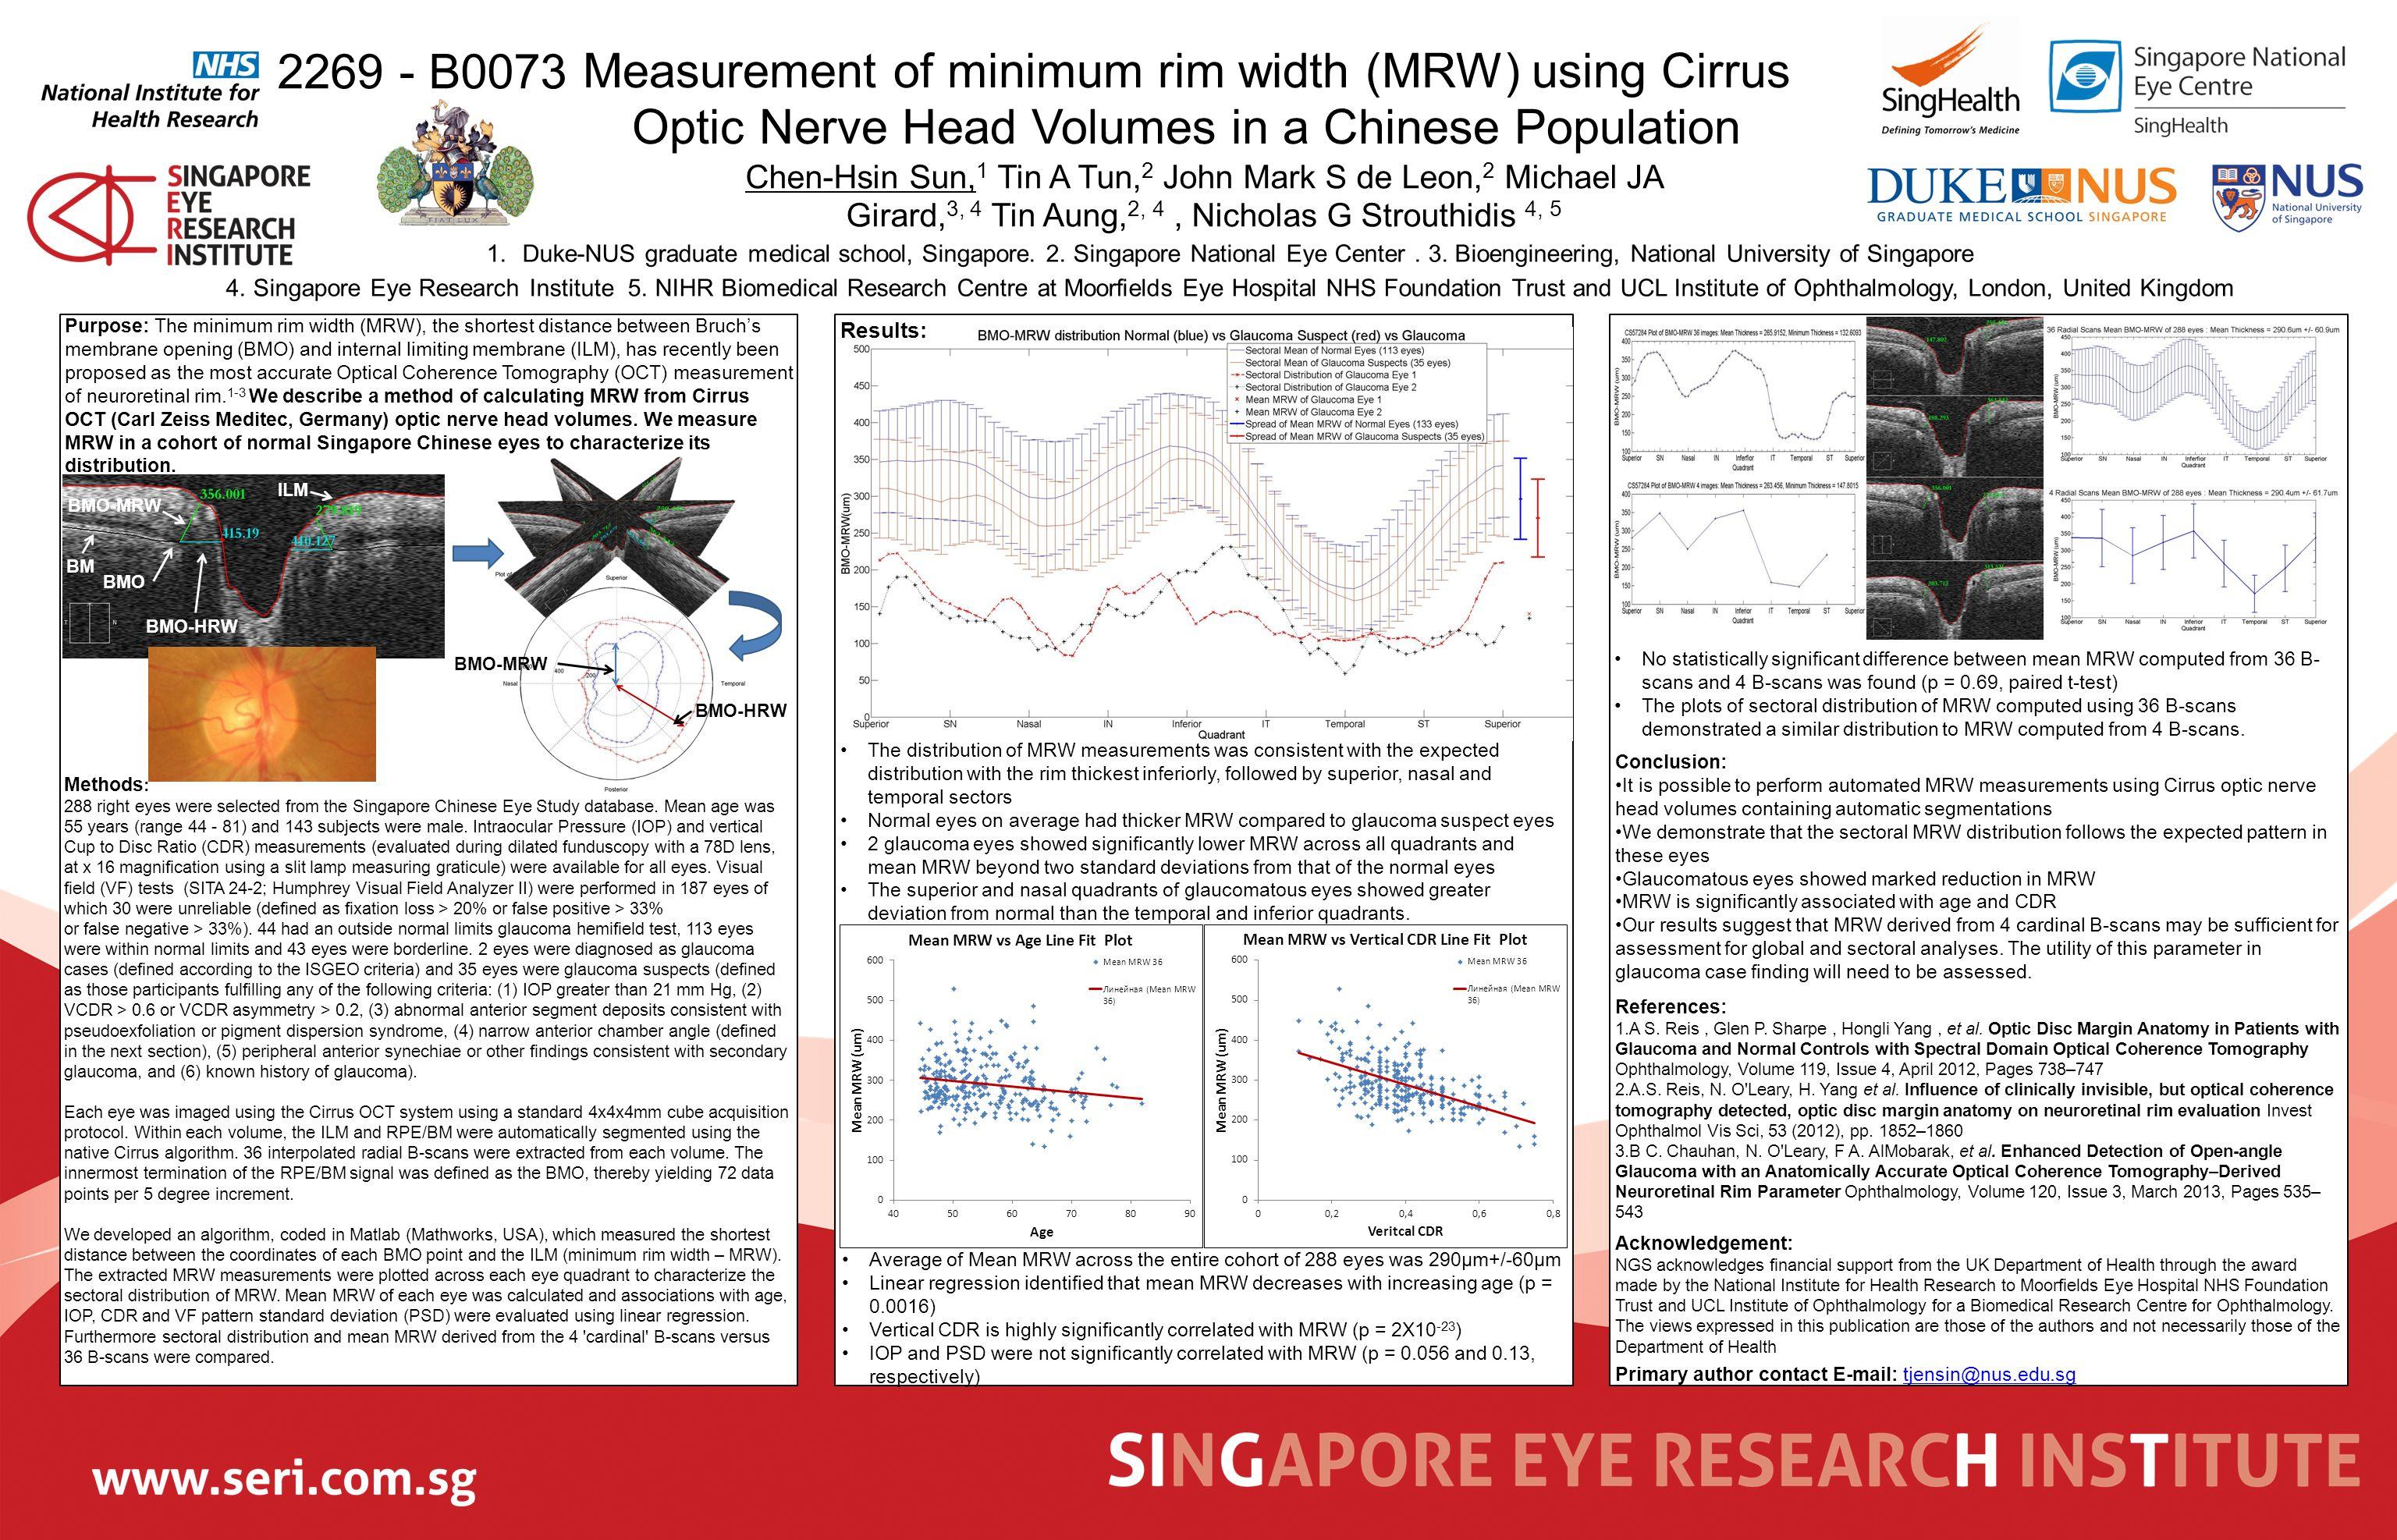 2269 - B0073 Measurement of minimum rim width (MRW) using Cirrus Optic Nerve Head Volumes in a Chinese Population.